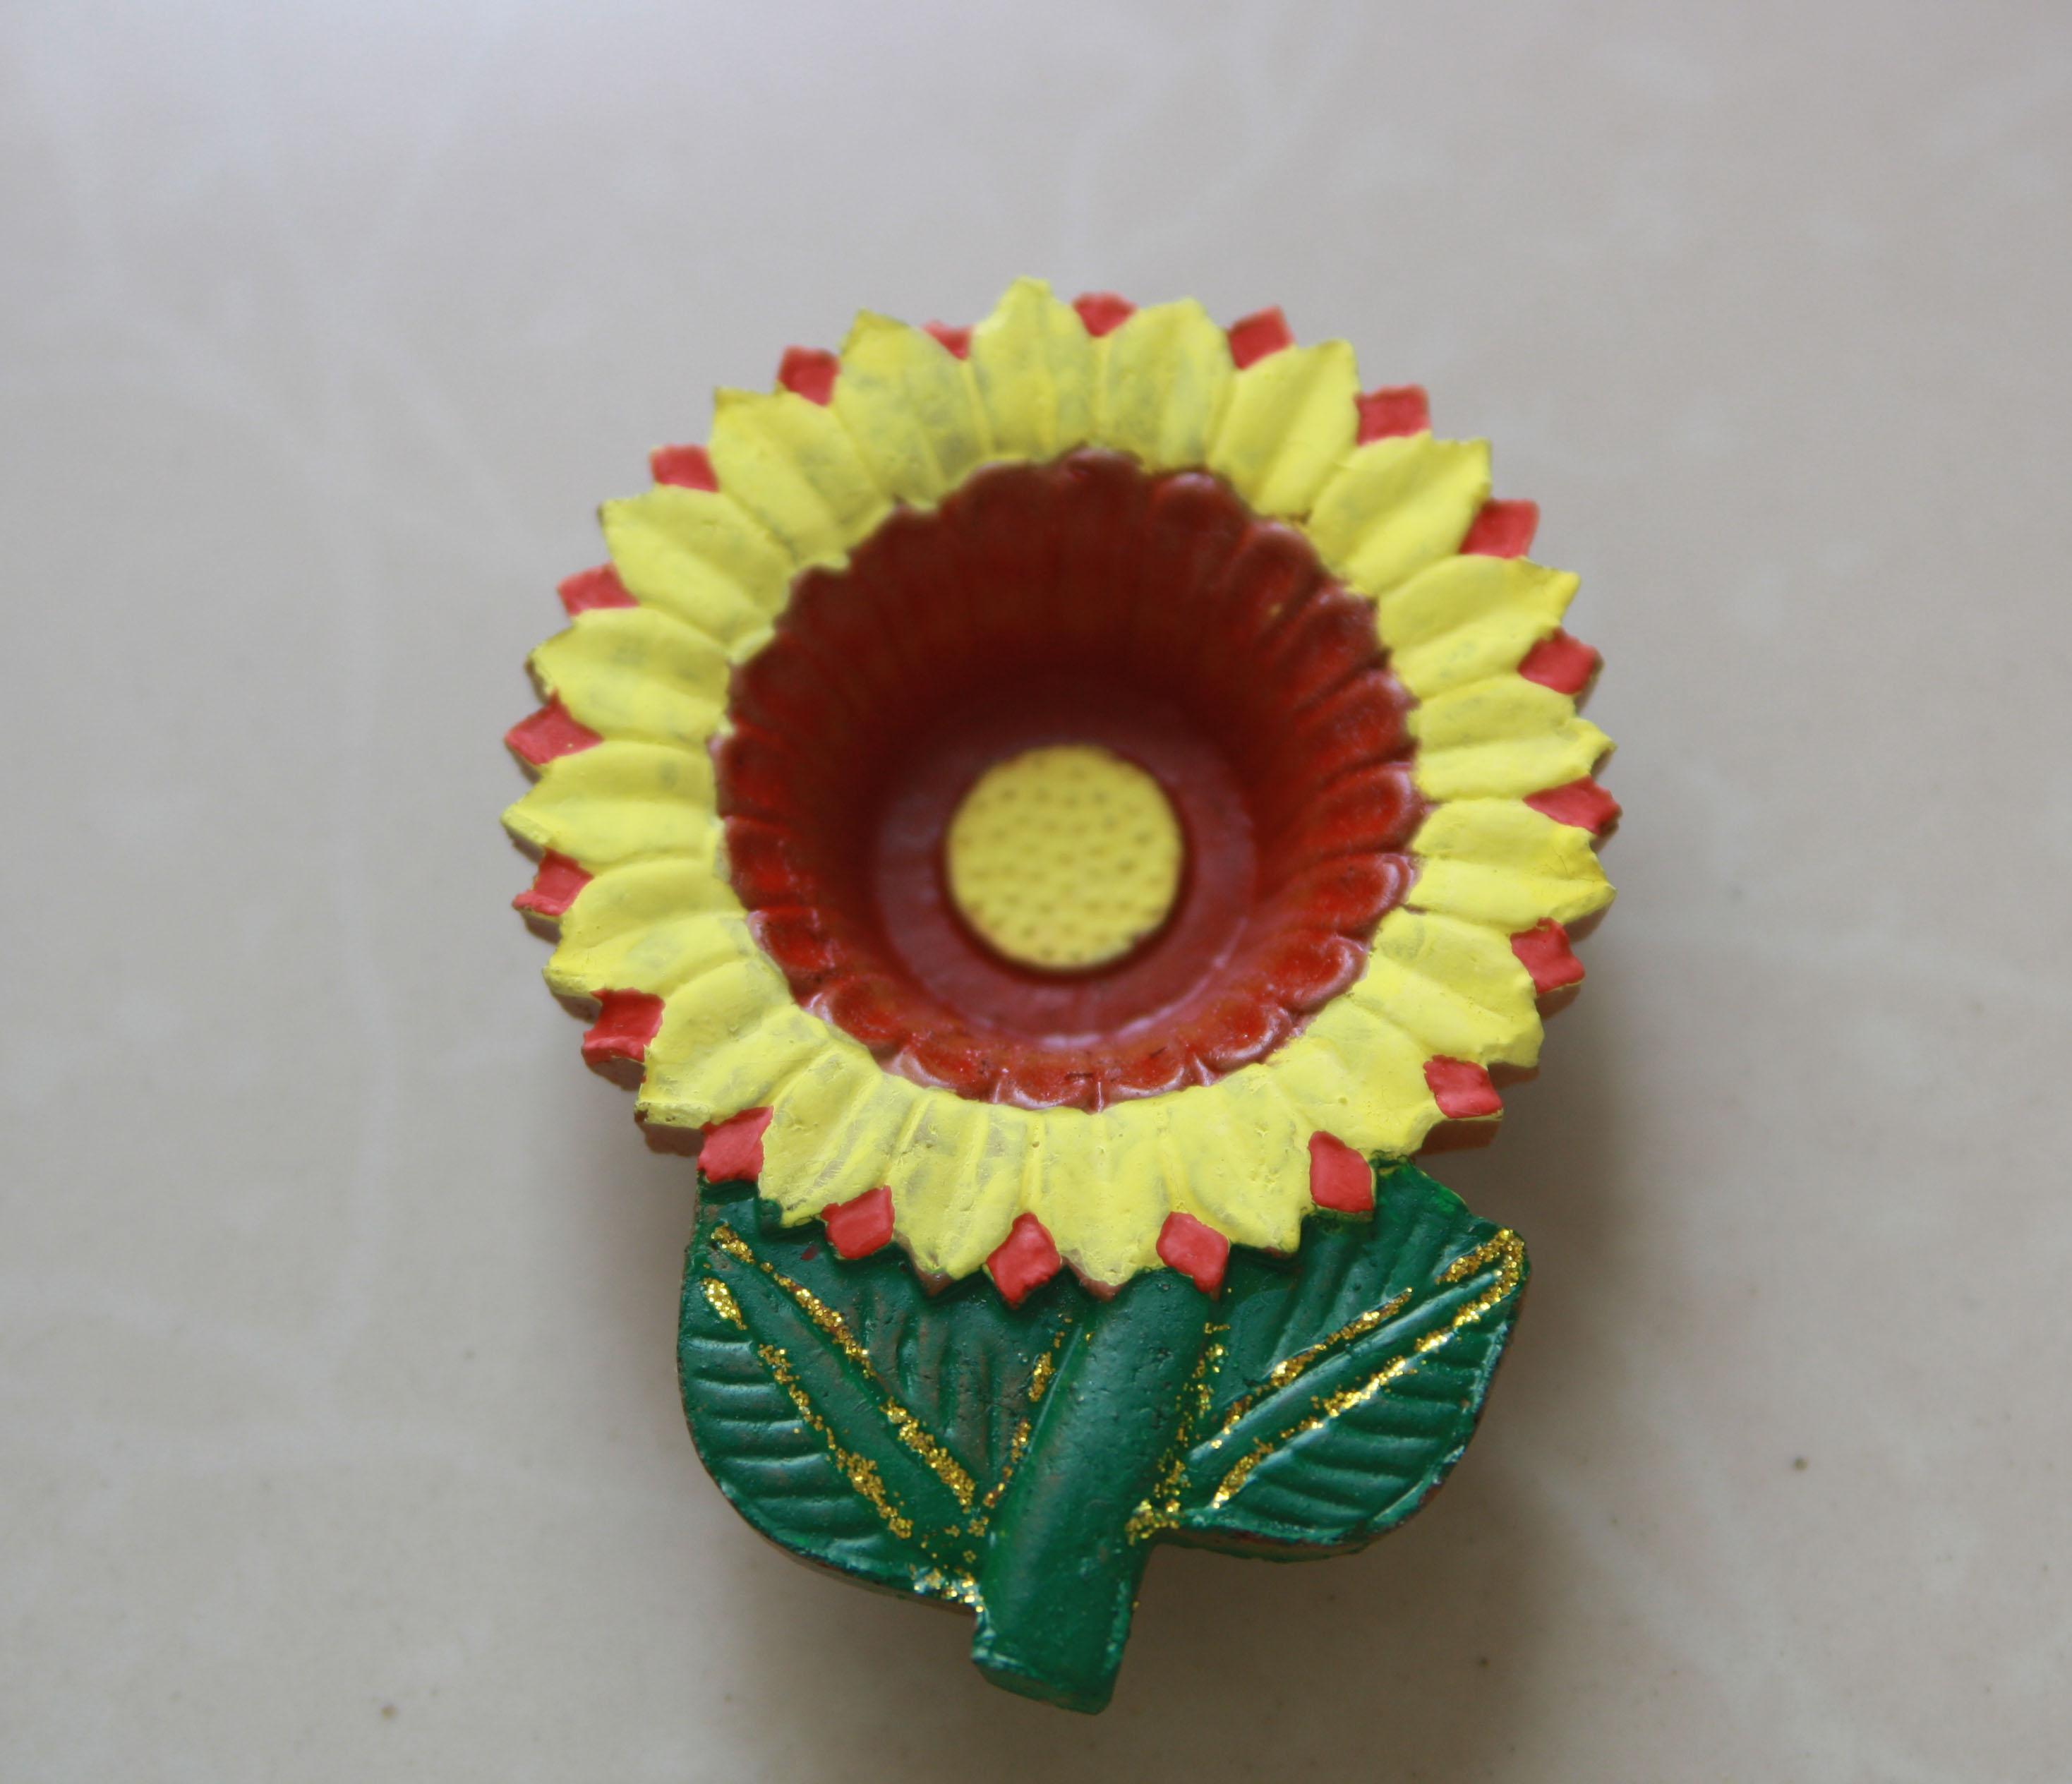 Diwali diya decoration ideas and crafts images for Art and craft diya decoration